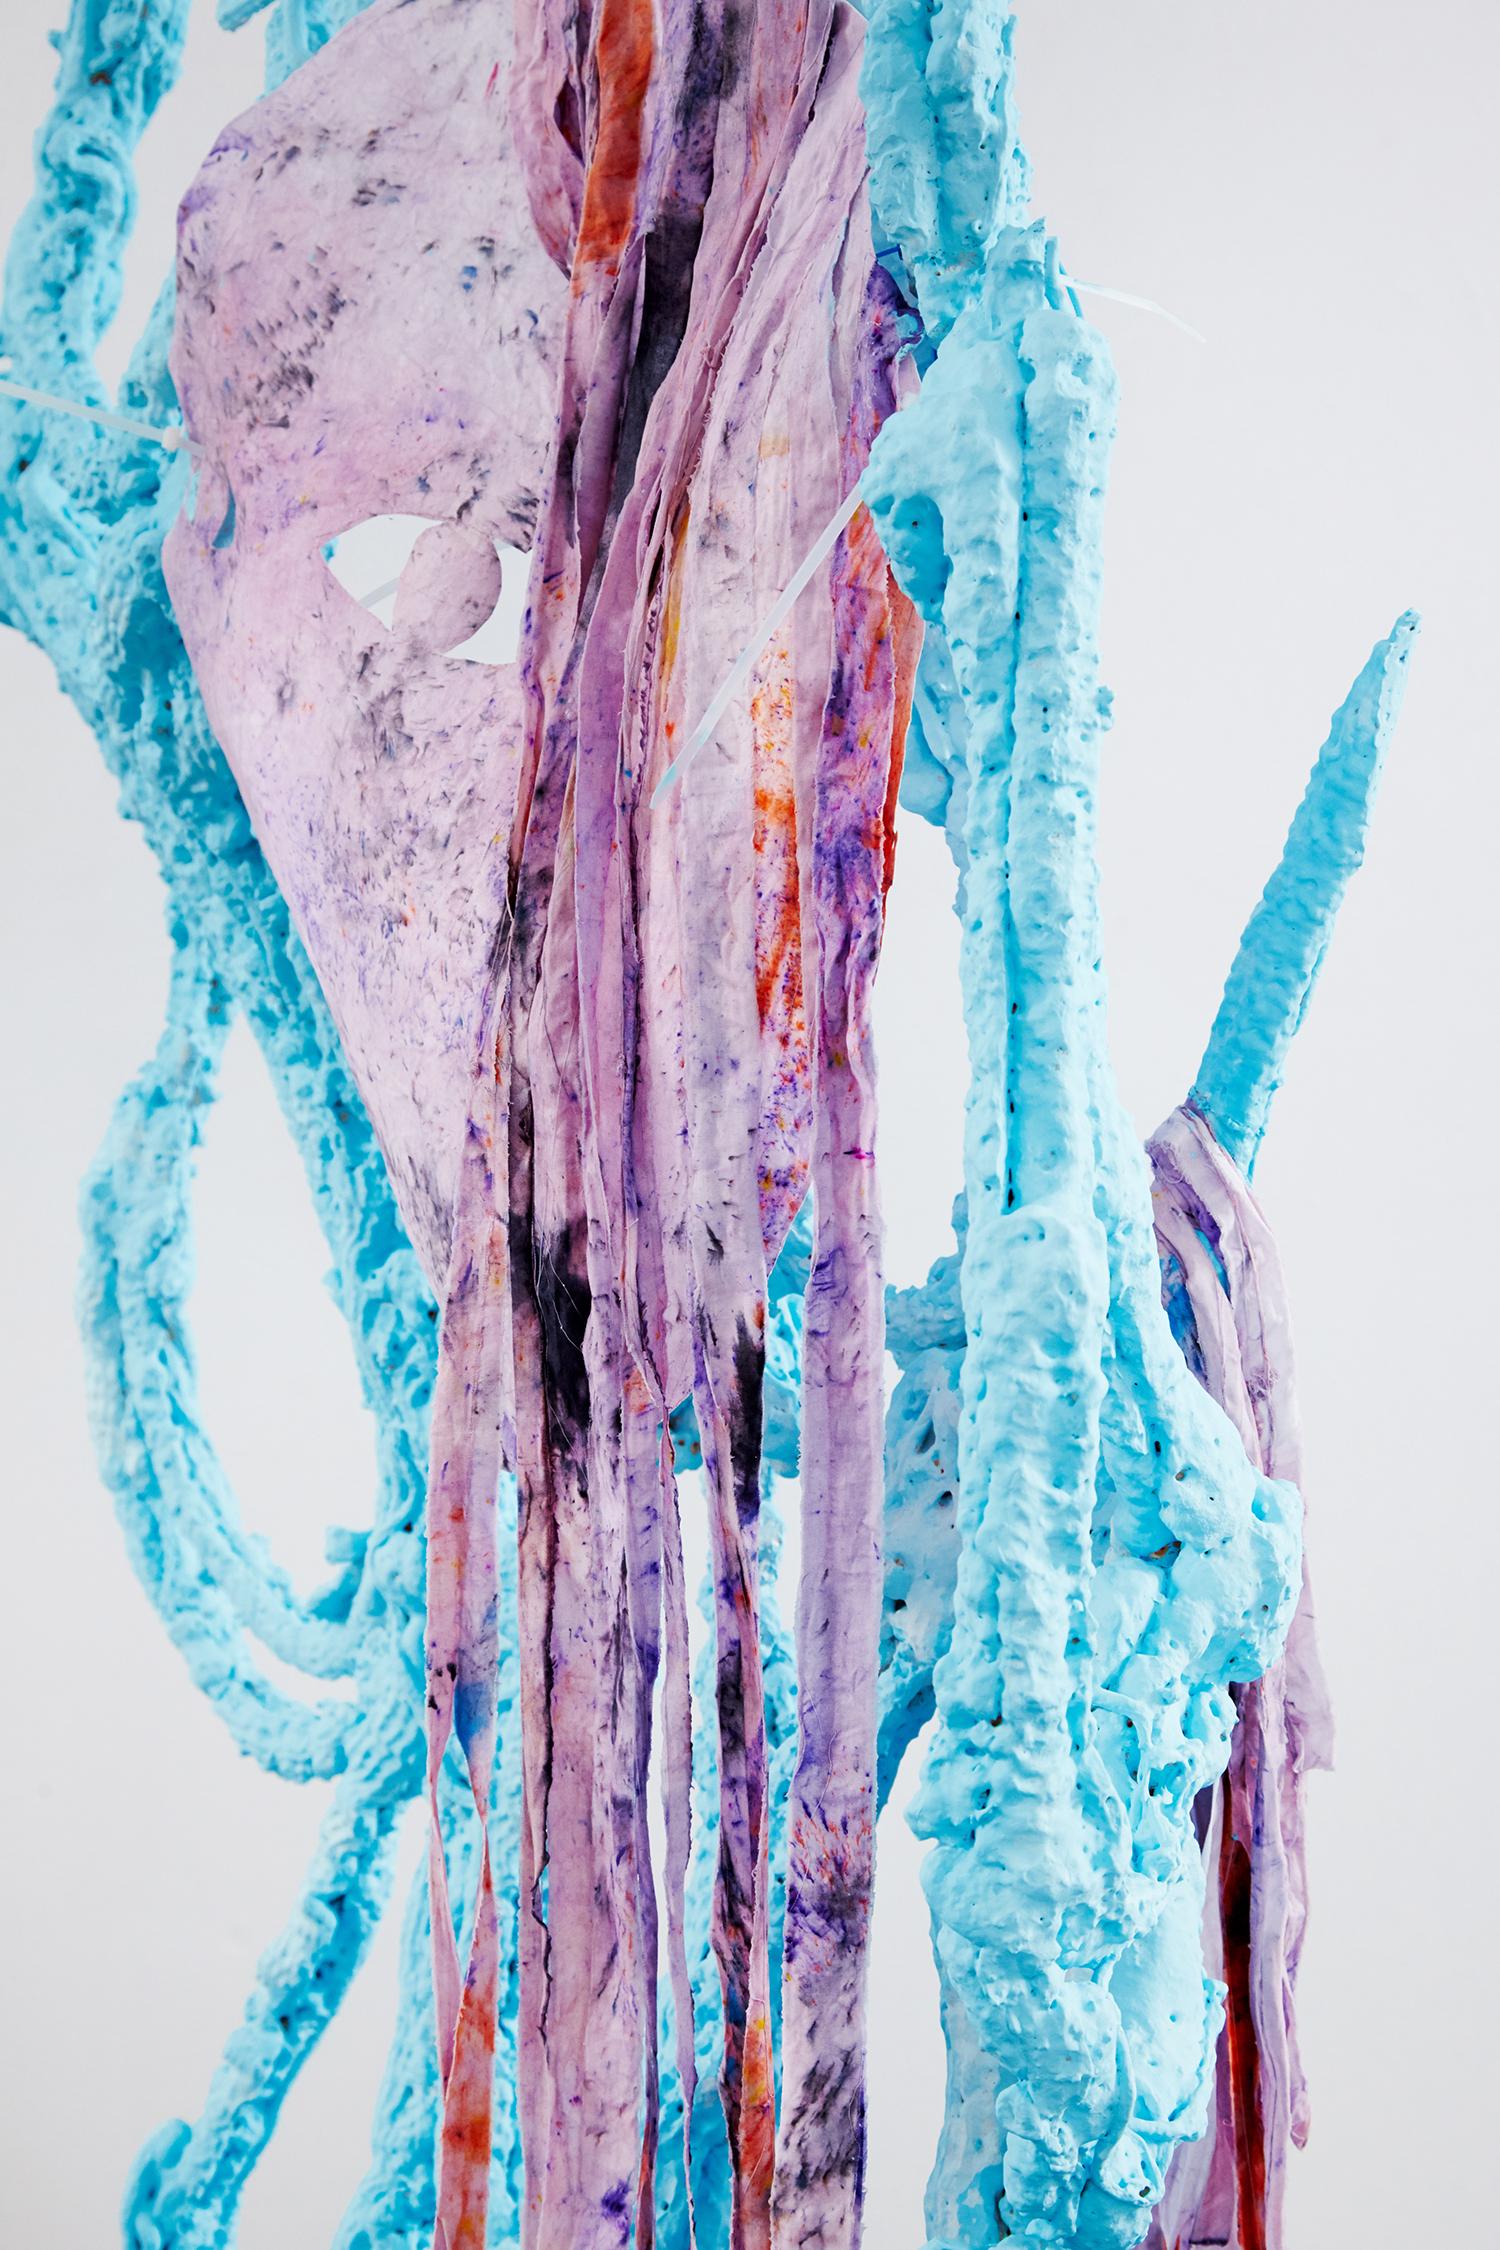 Trophy (The Saddest Profile Picture), 2016, expanding foam, textile dye, waterglass, rope. | Photo: Krisztián Zana.